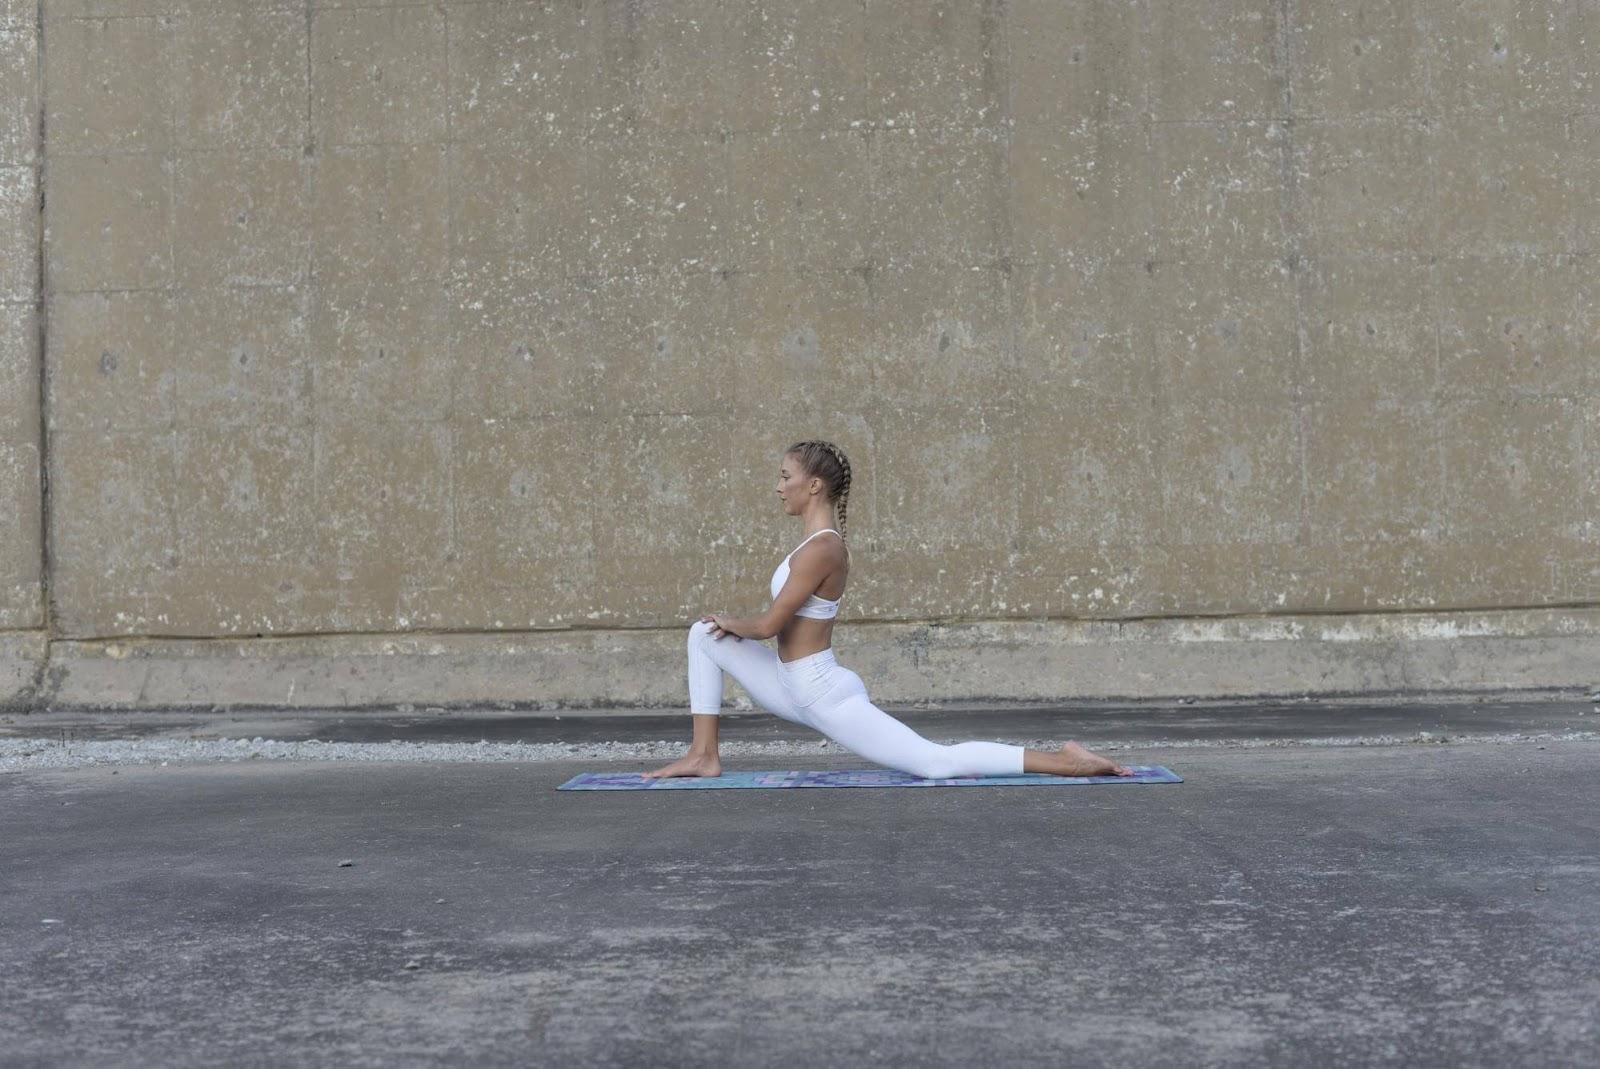 Woman in half kneeling position